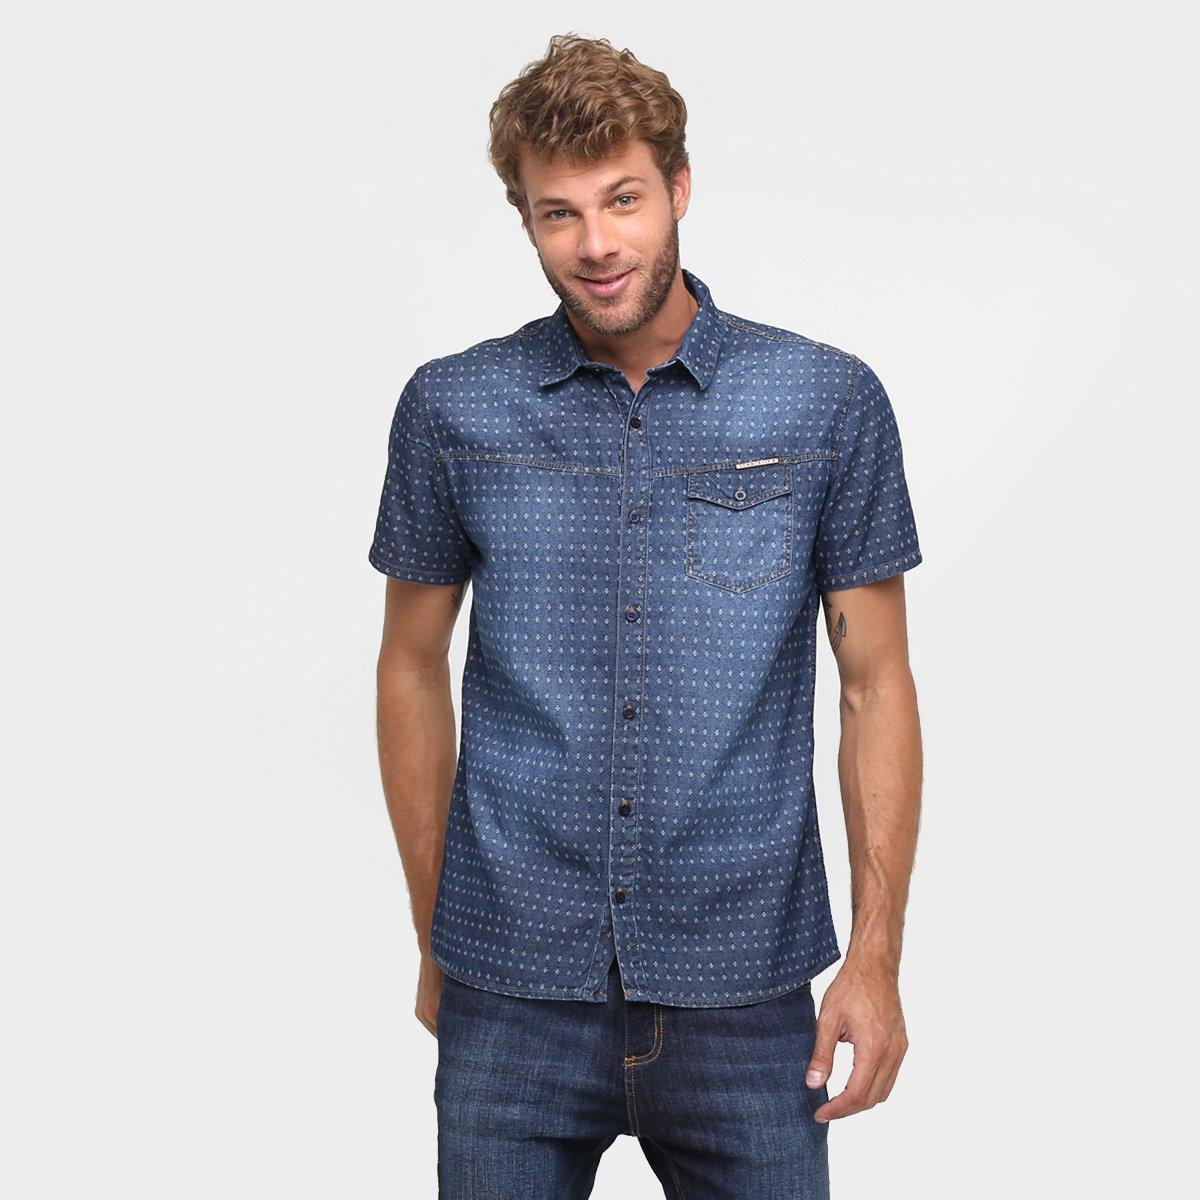 ab978aa649 Camisa Jeans Sommer Maquinetada - Compre Agora